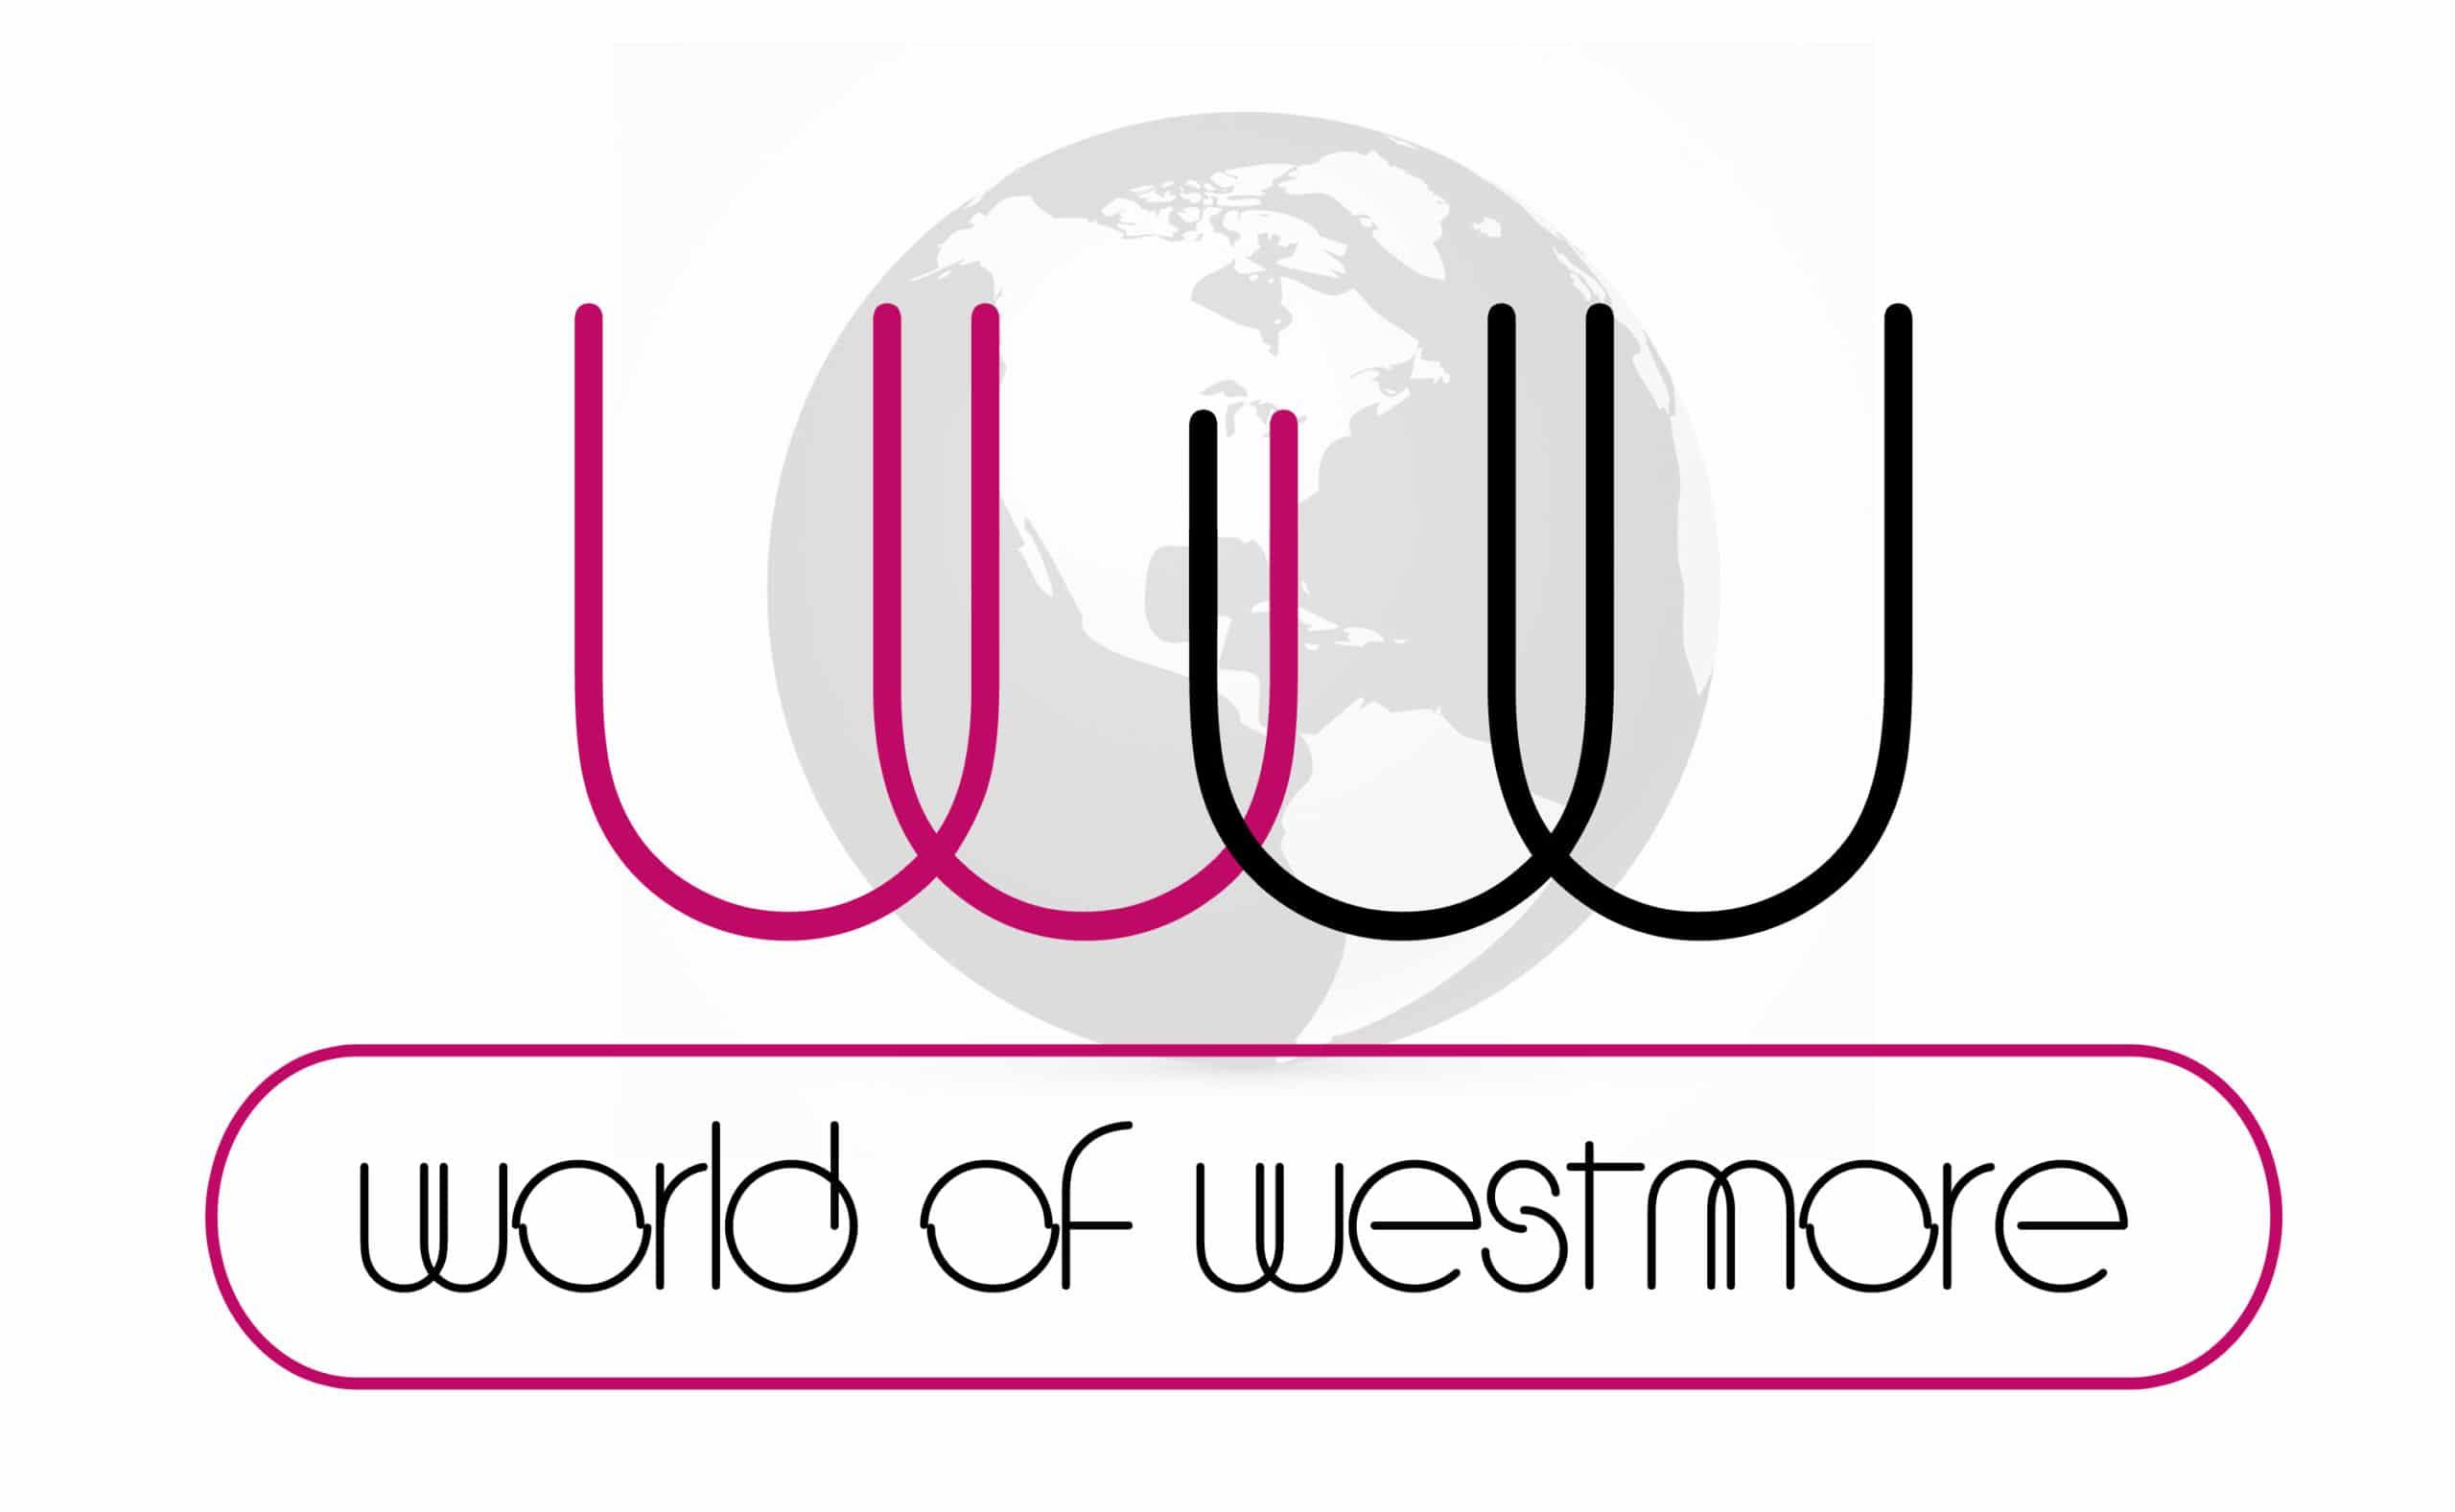 LOGO - WORLD OF WESTMORE